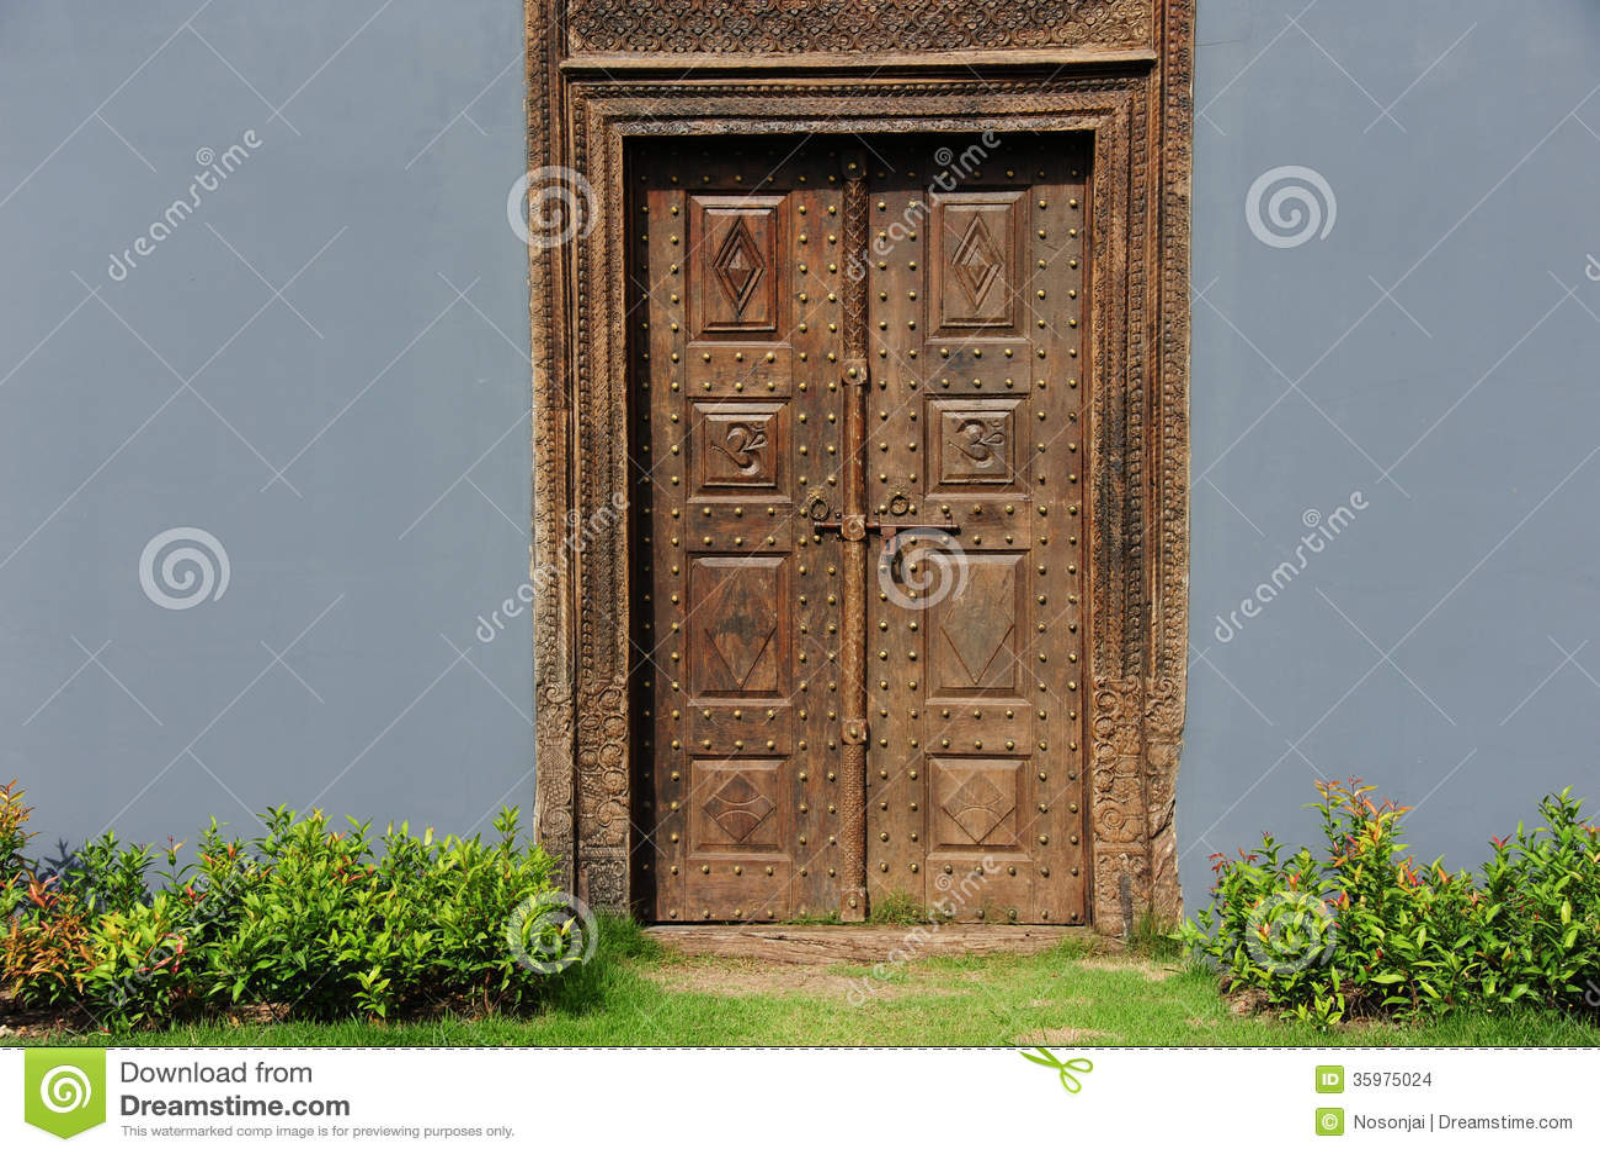 Vintage wood doors sexy amateurs pics for Reuse old wooden doors